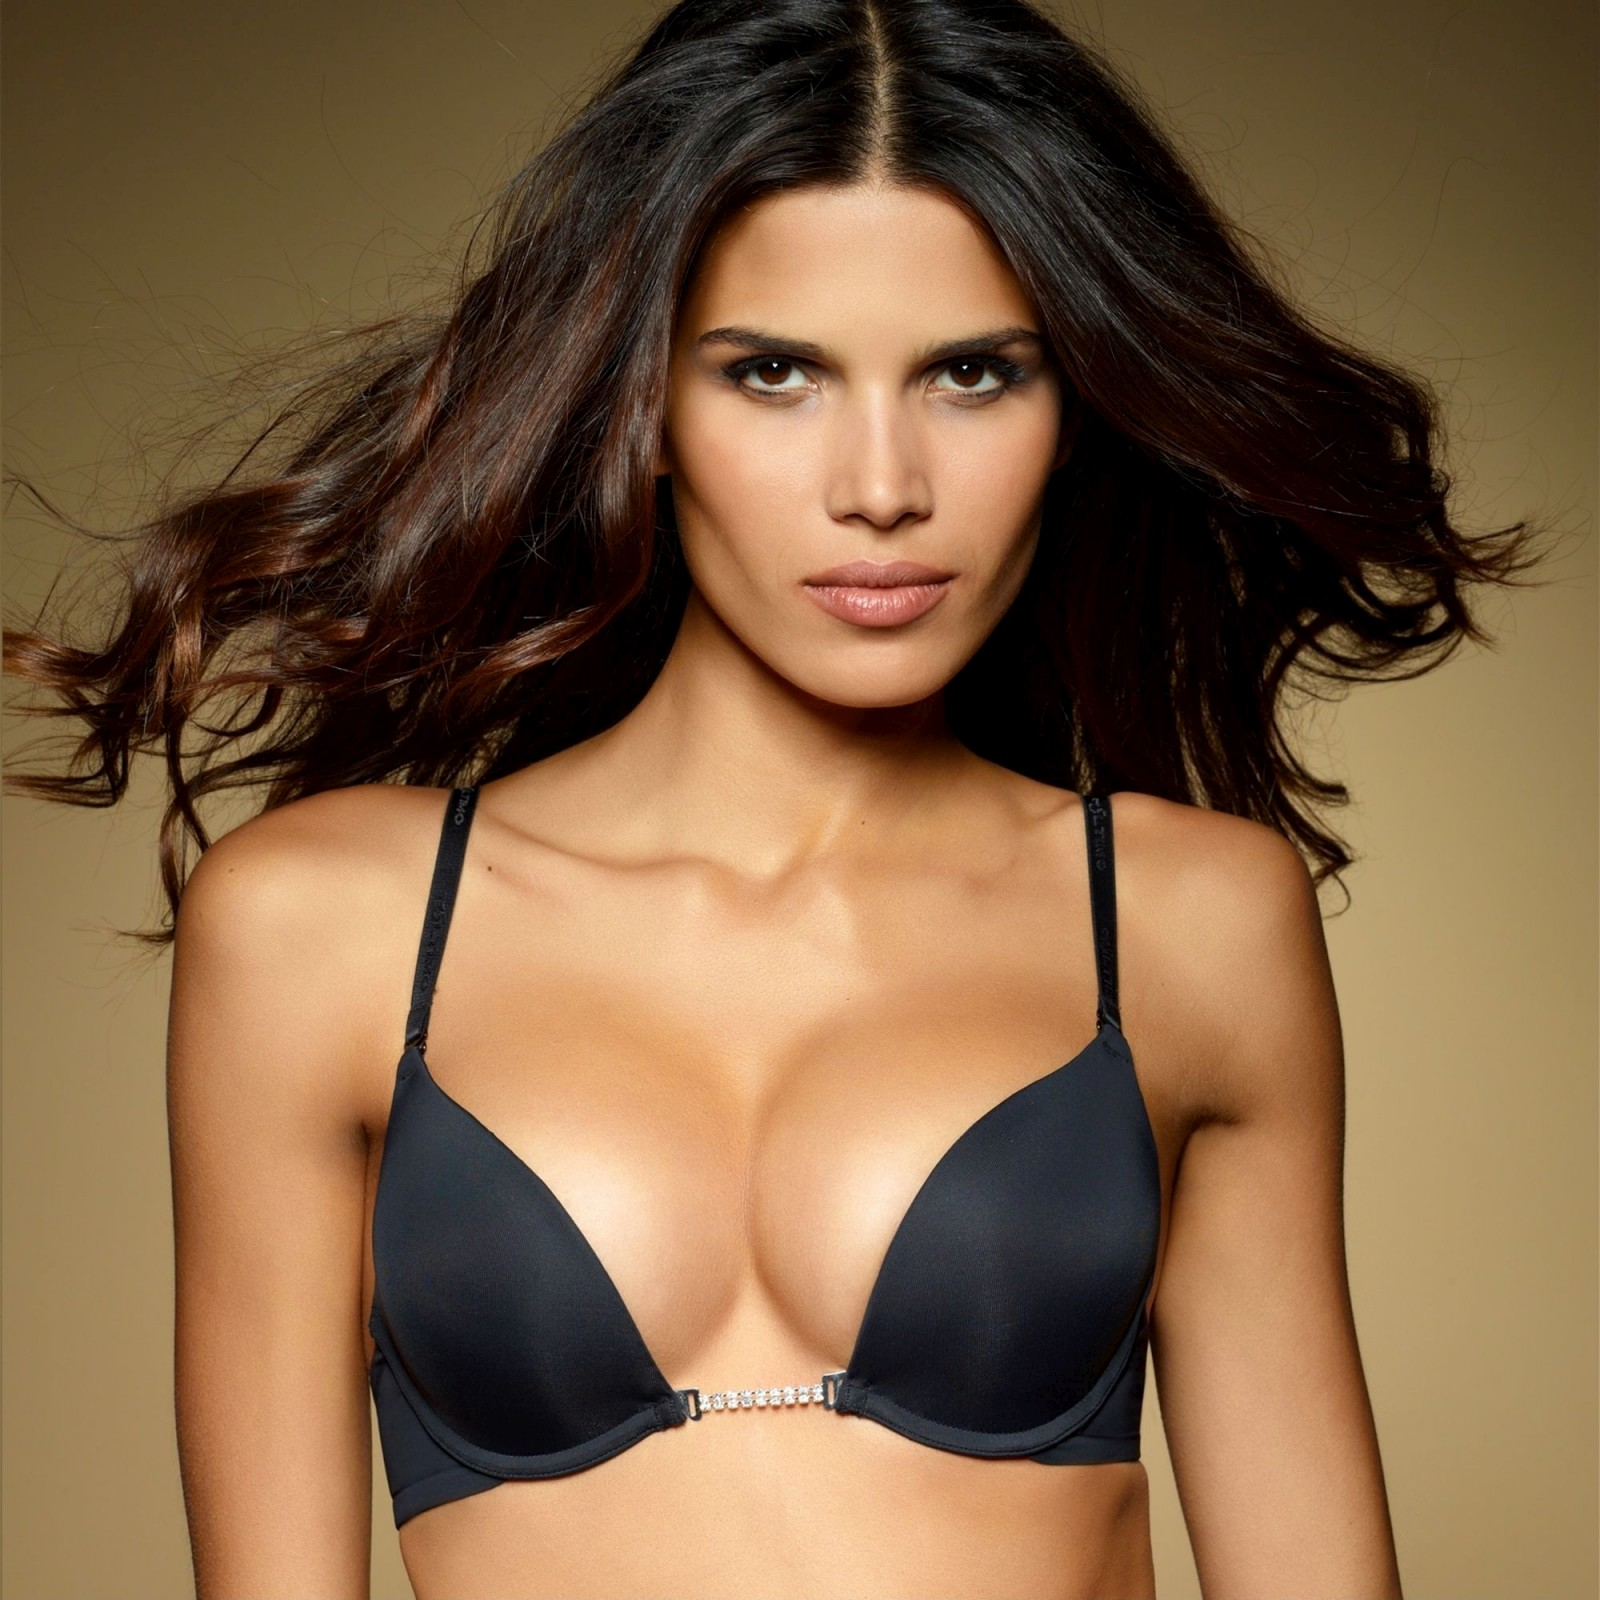 Porno Hacked Raica Oliveira BRA  nudes (58 pics), iCloud, bra